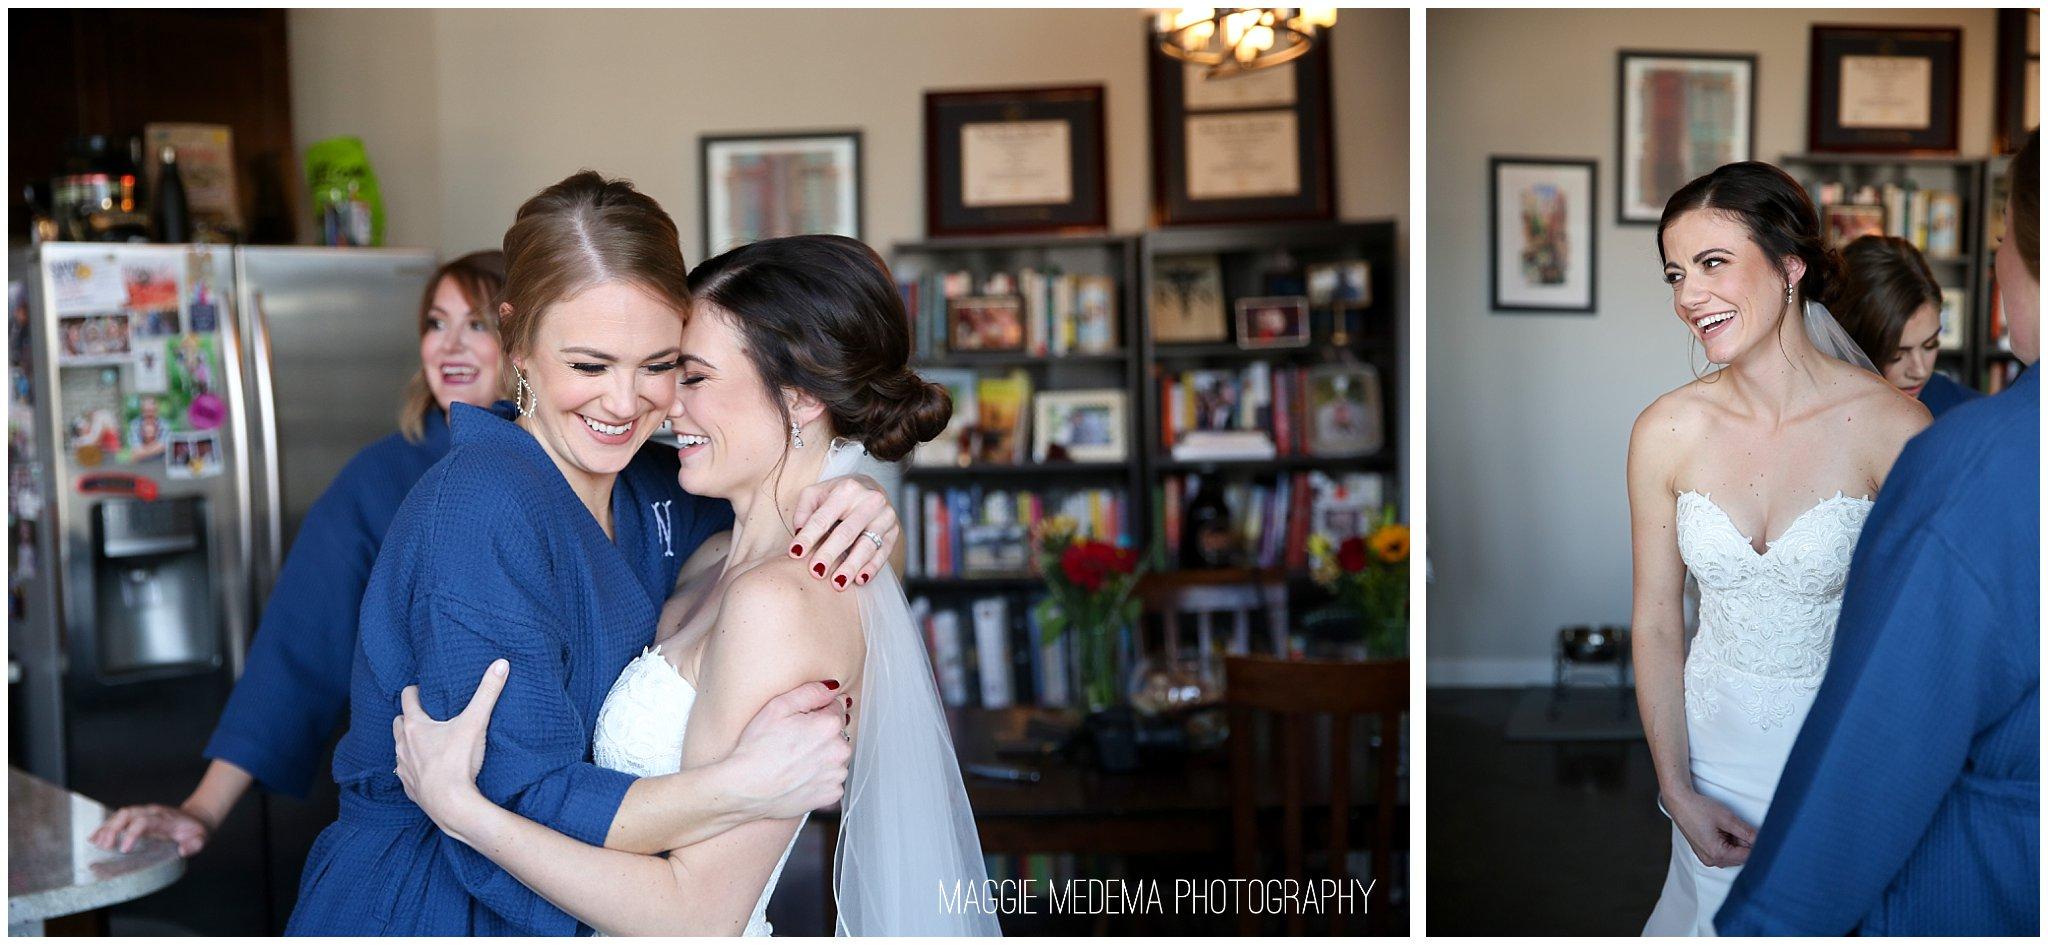 St. Louis Wedding Photography, St. Louis Loft Wedding